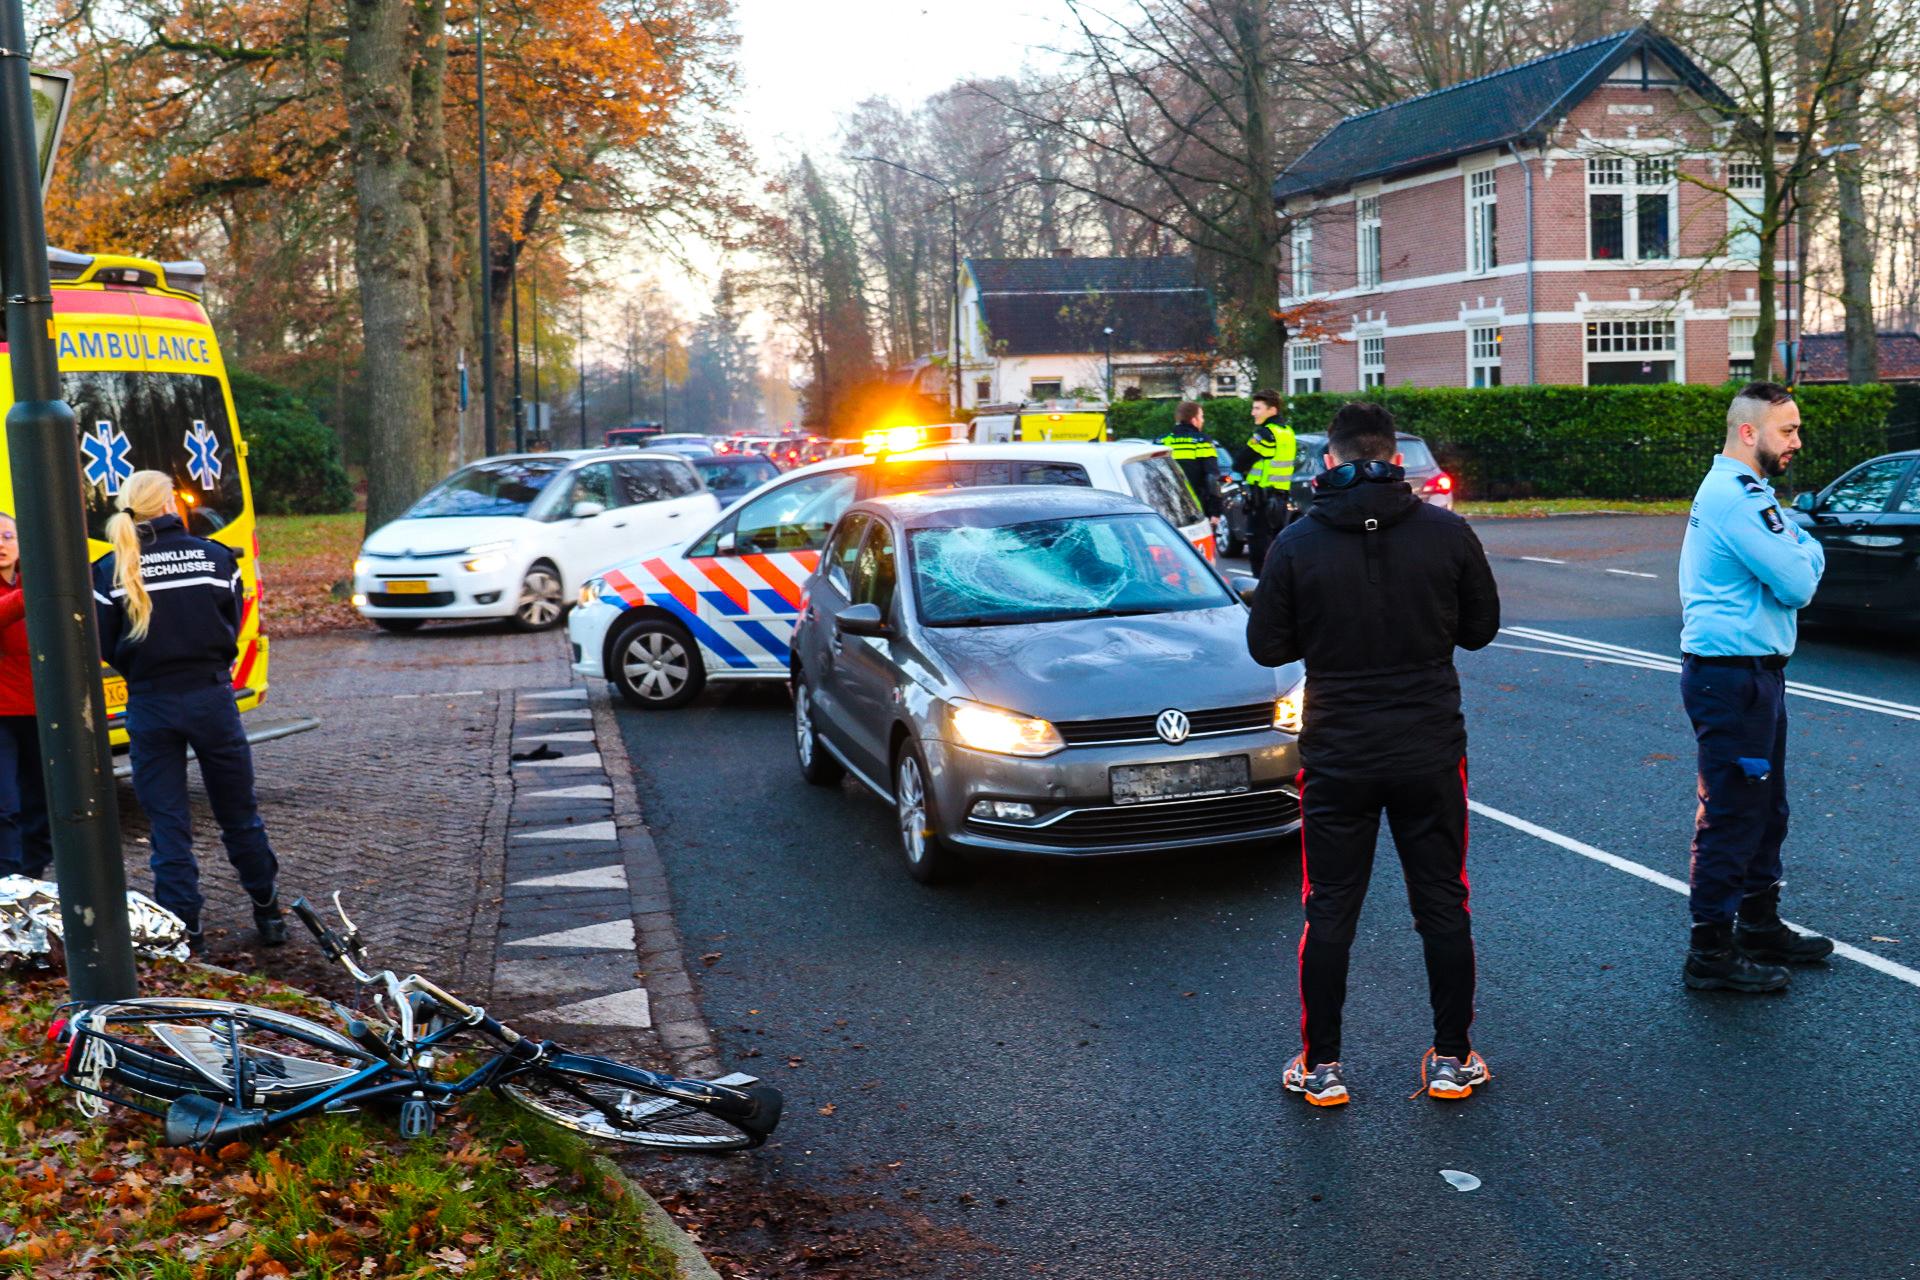 Auto schept fietser op Europaweg; fietser gewond naar ziekenhuis